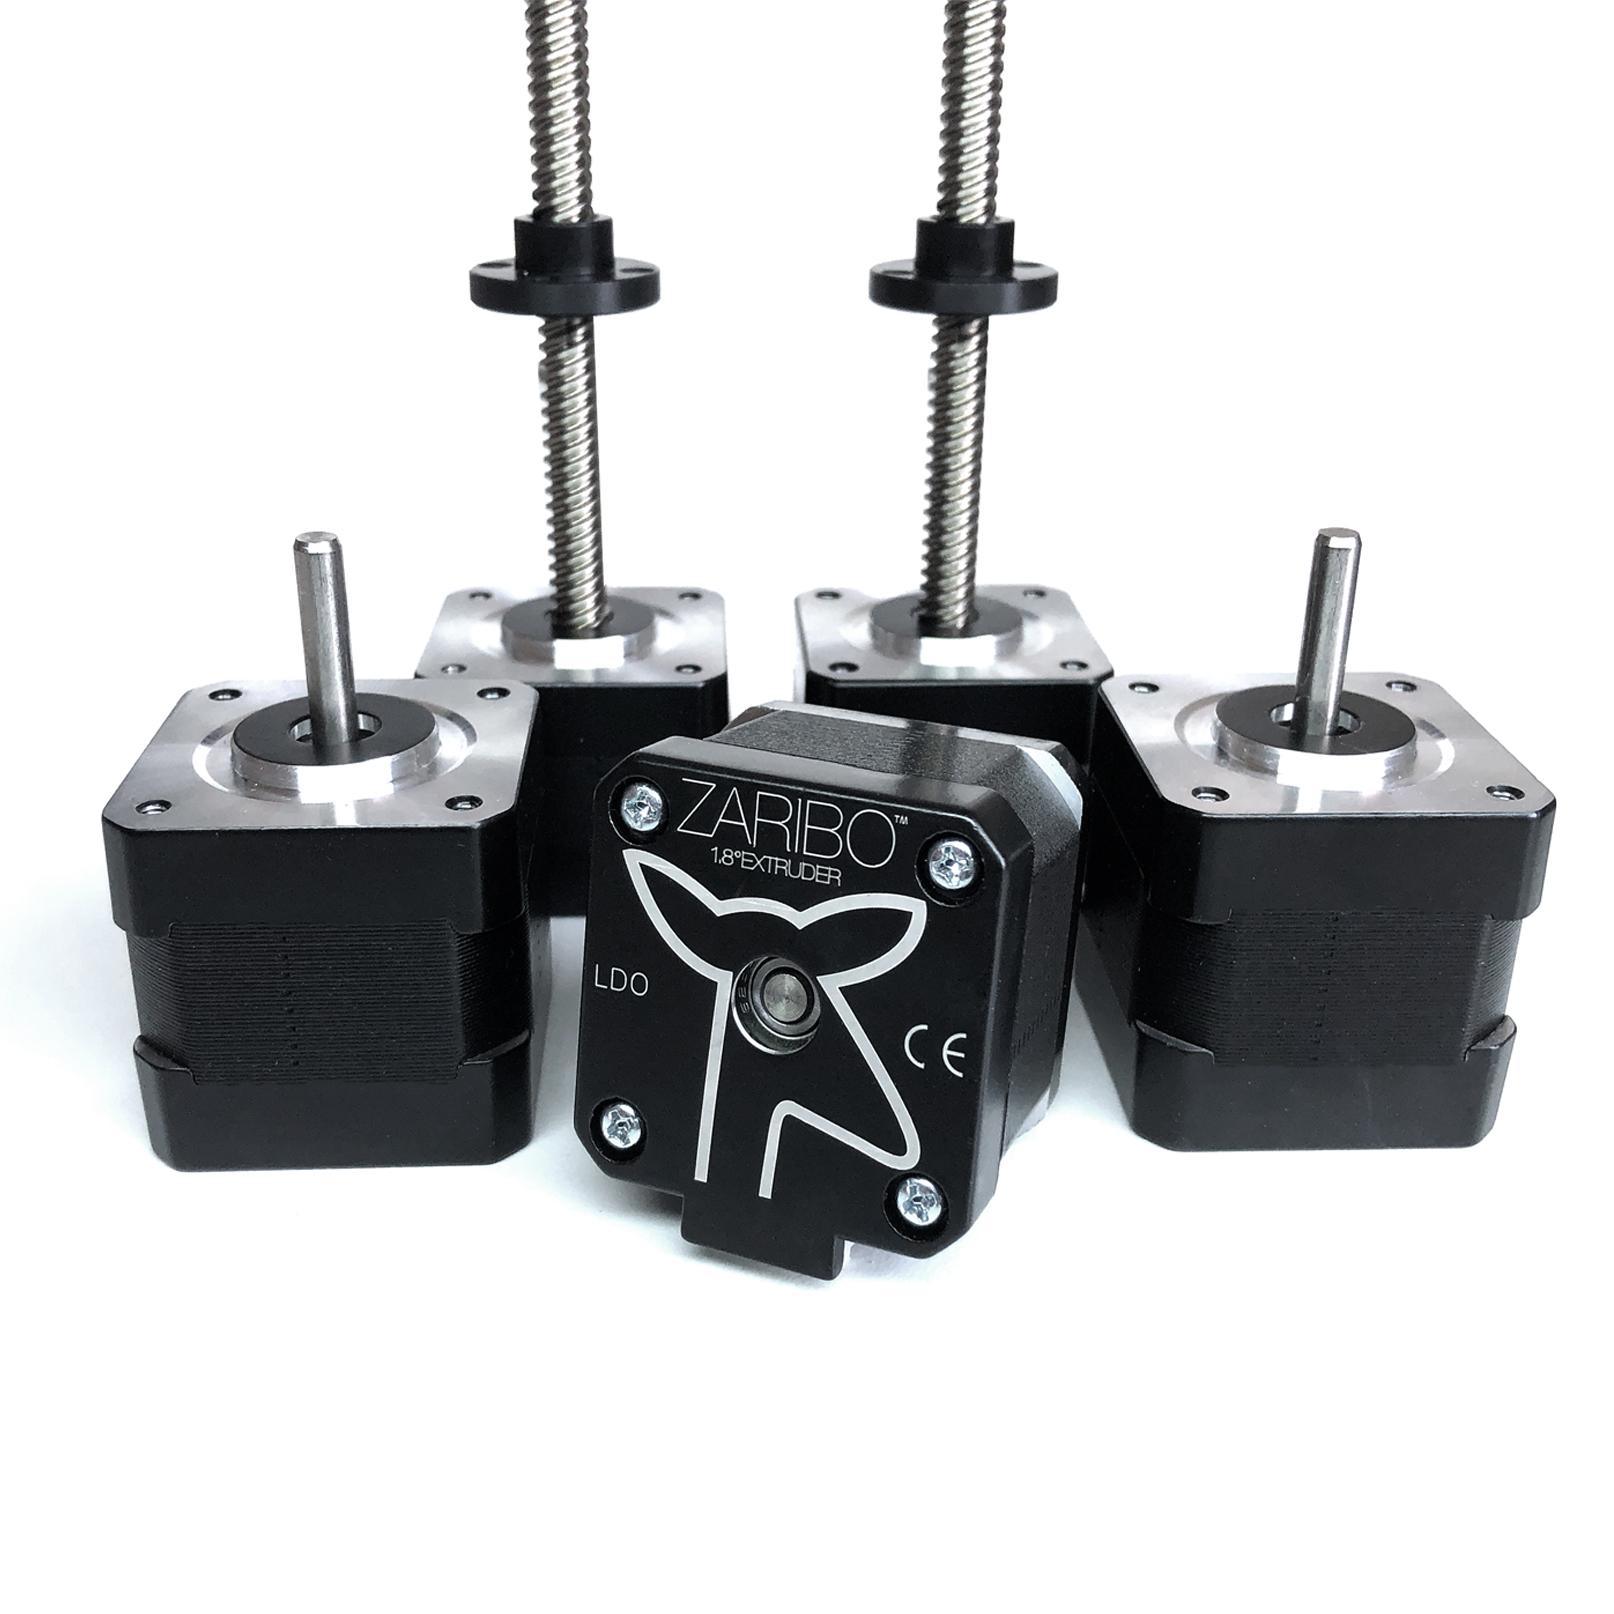 Nema 17 high quality stepper motors for 3D printers